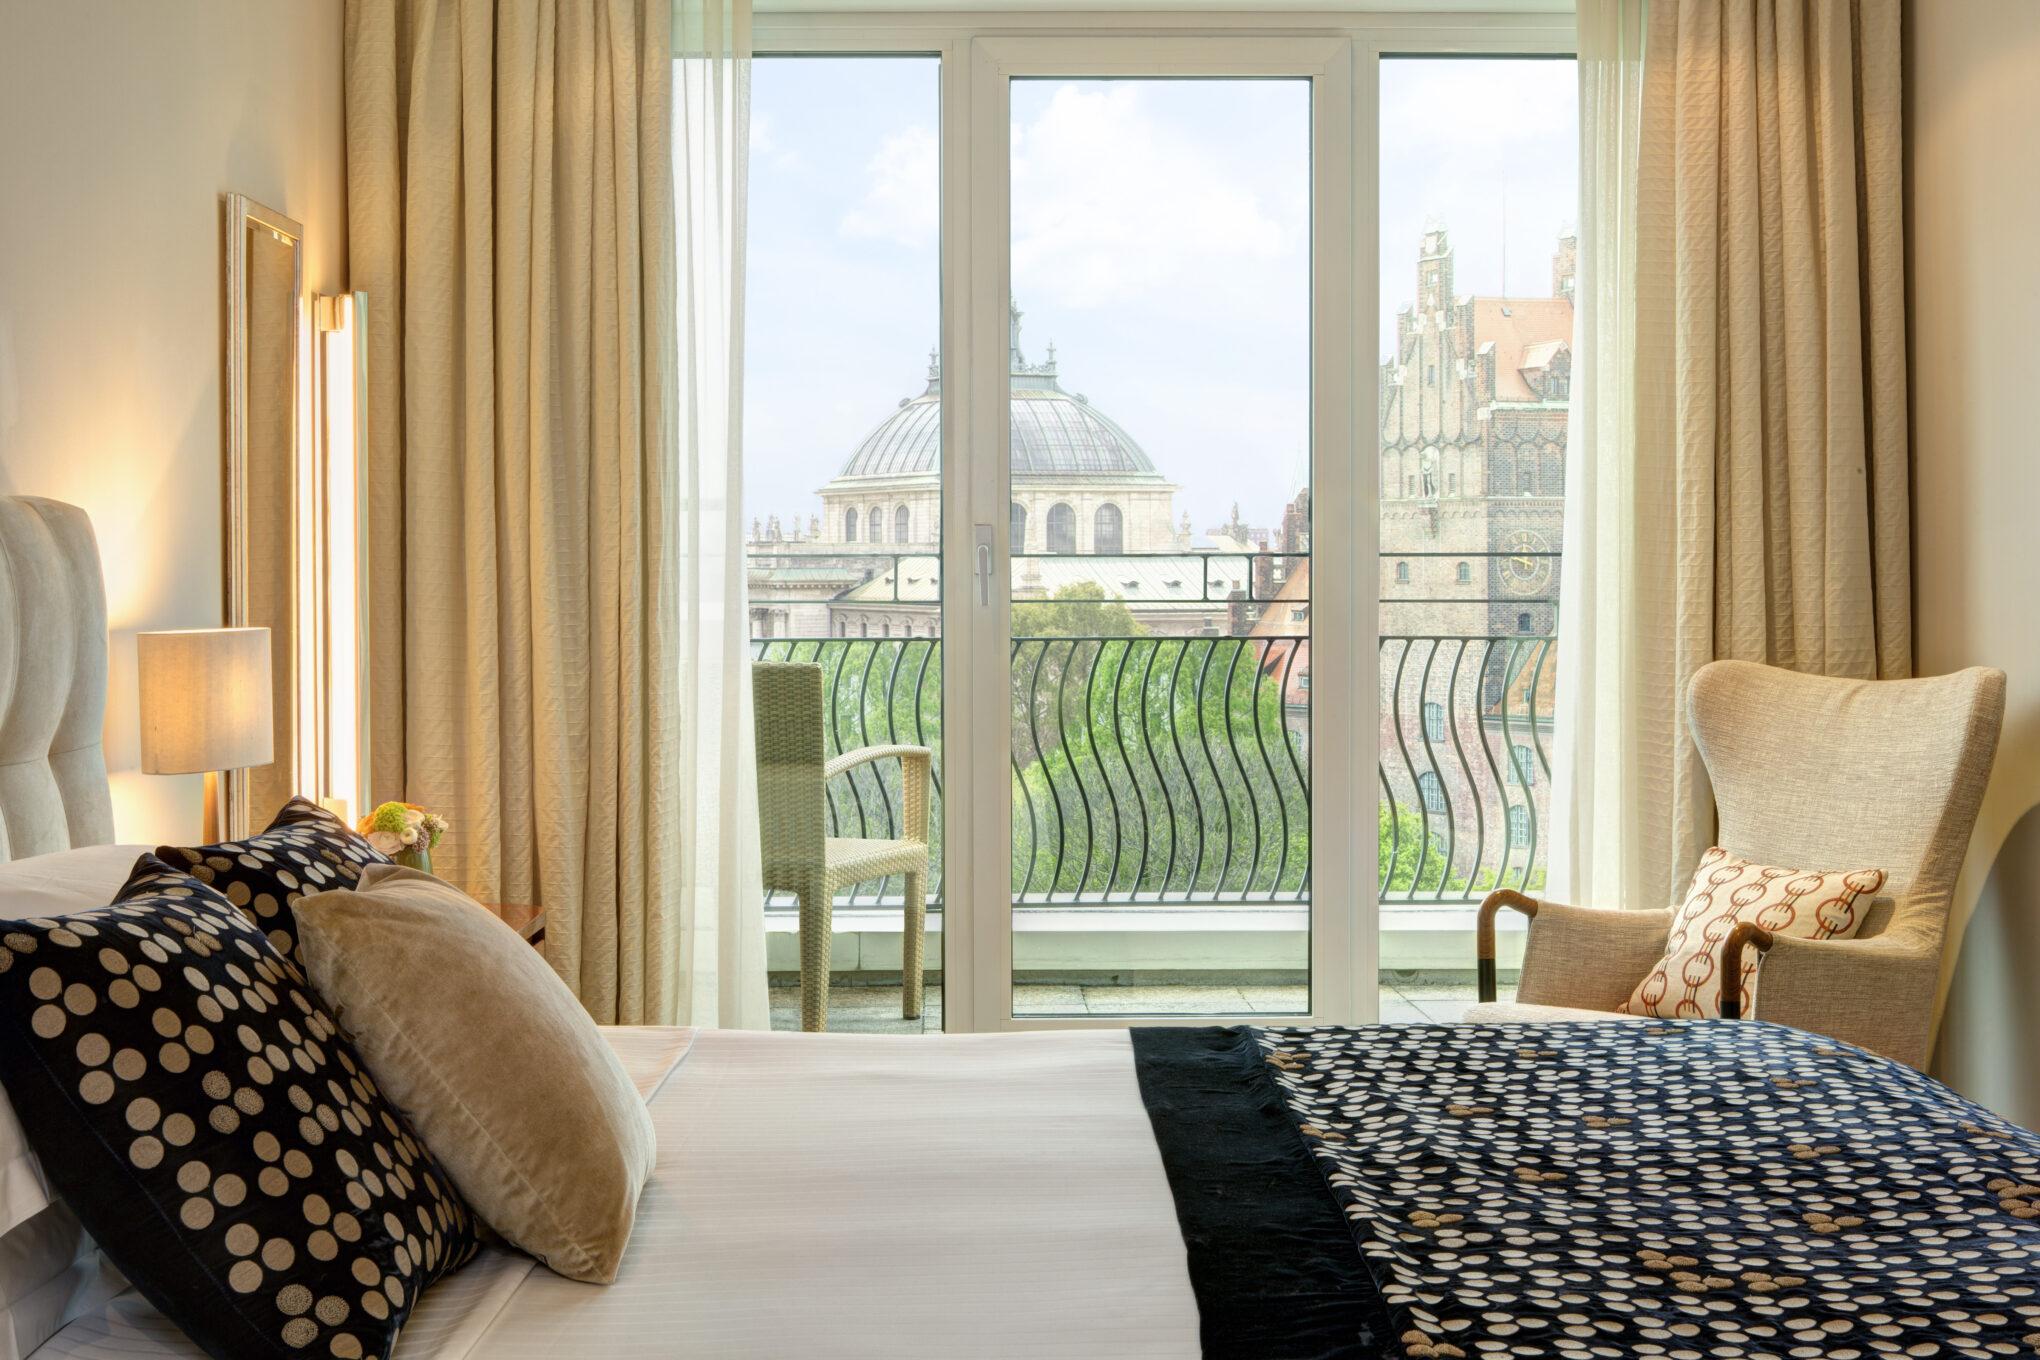 The Charles Hotel Rocco Forte Blick aus dem Schlafzimmer der Monforte Royal Suite